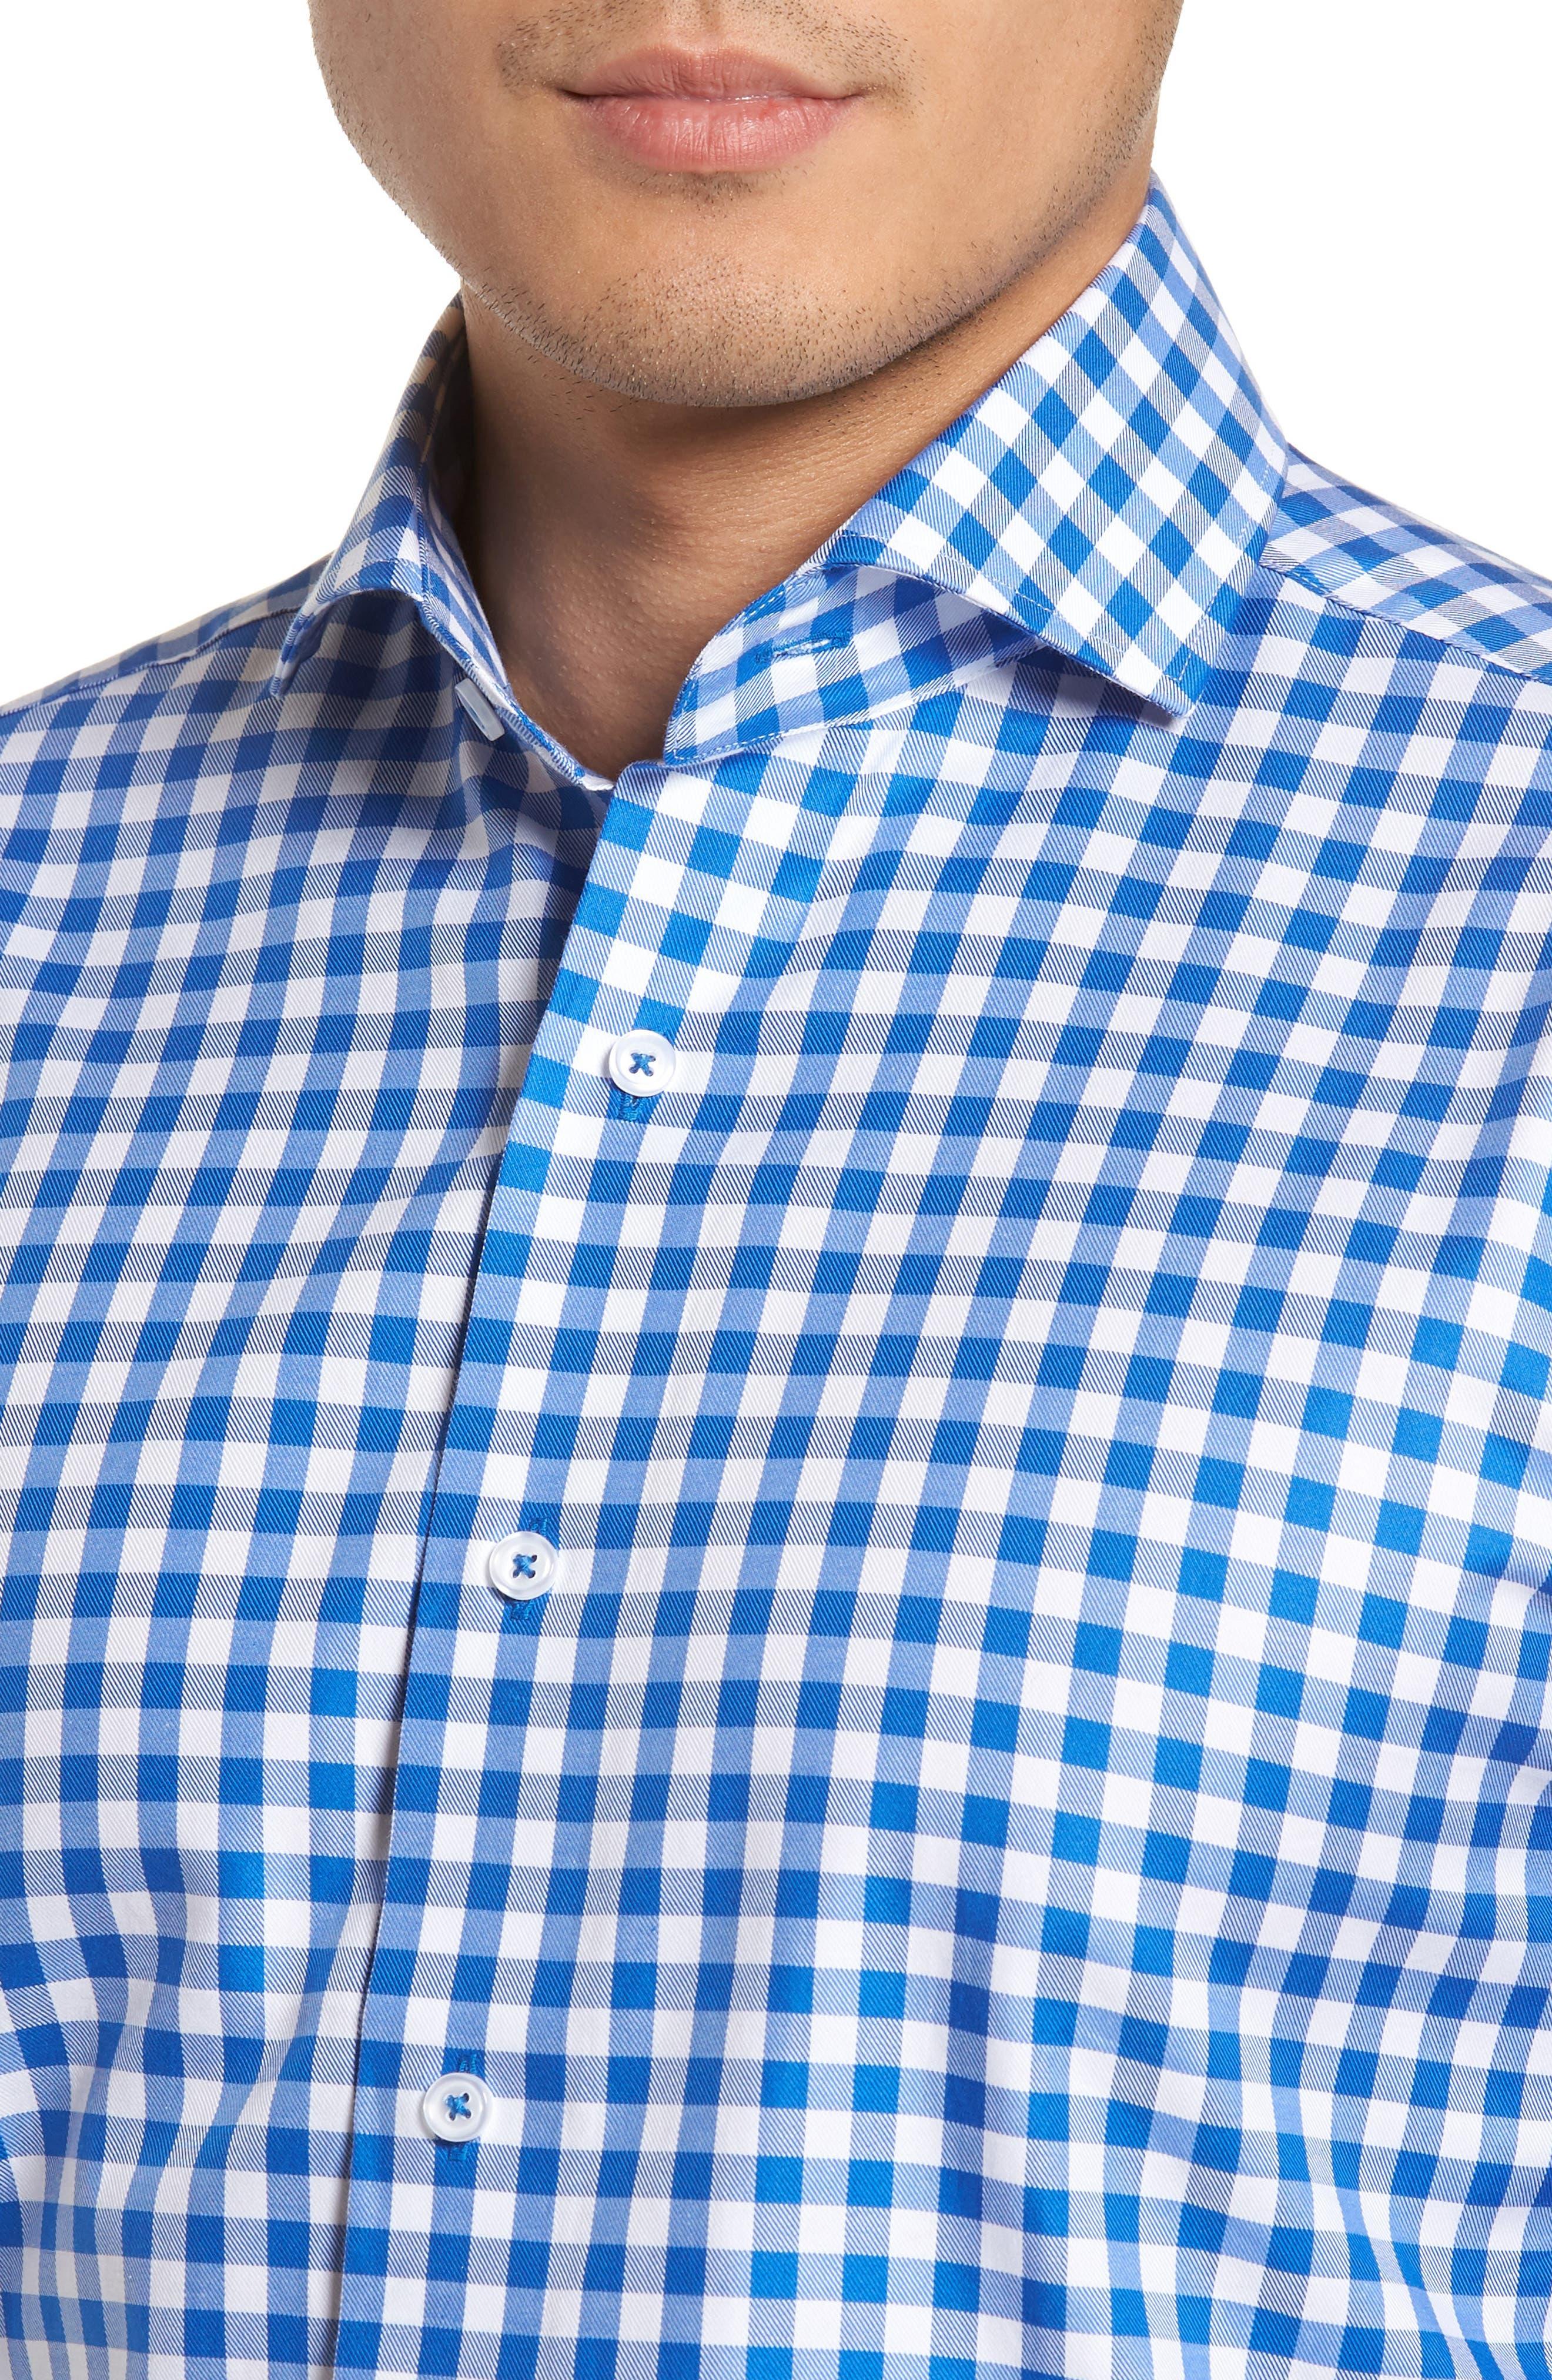 Trim Fit Gingham Dress Shirt,                             Alternate thumbnail 2, color,                             404